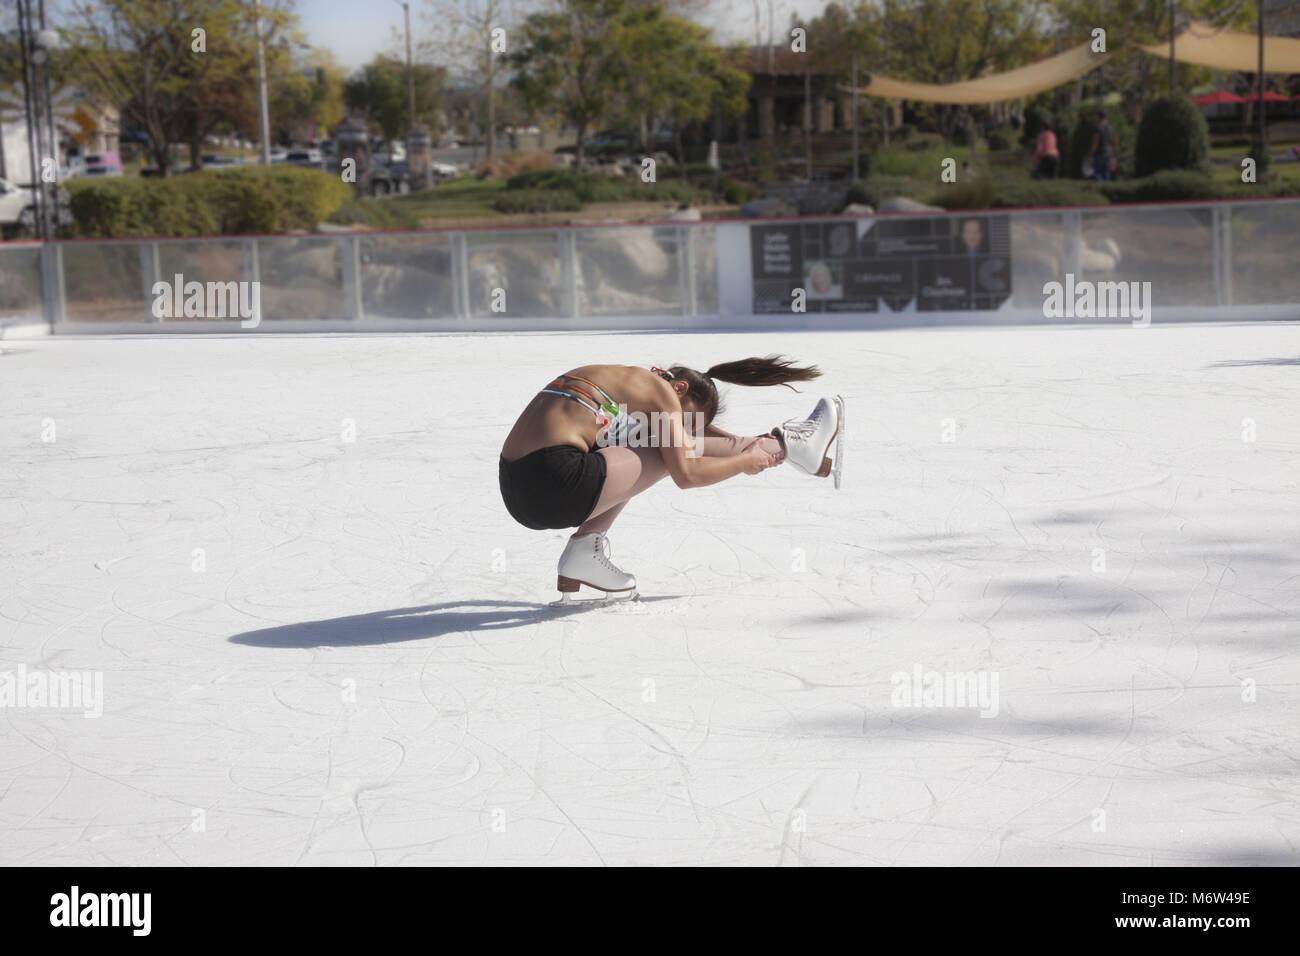 ice skating rink outdoor stock photos  u0026 ice skating rink